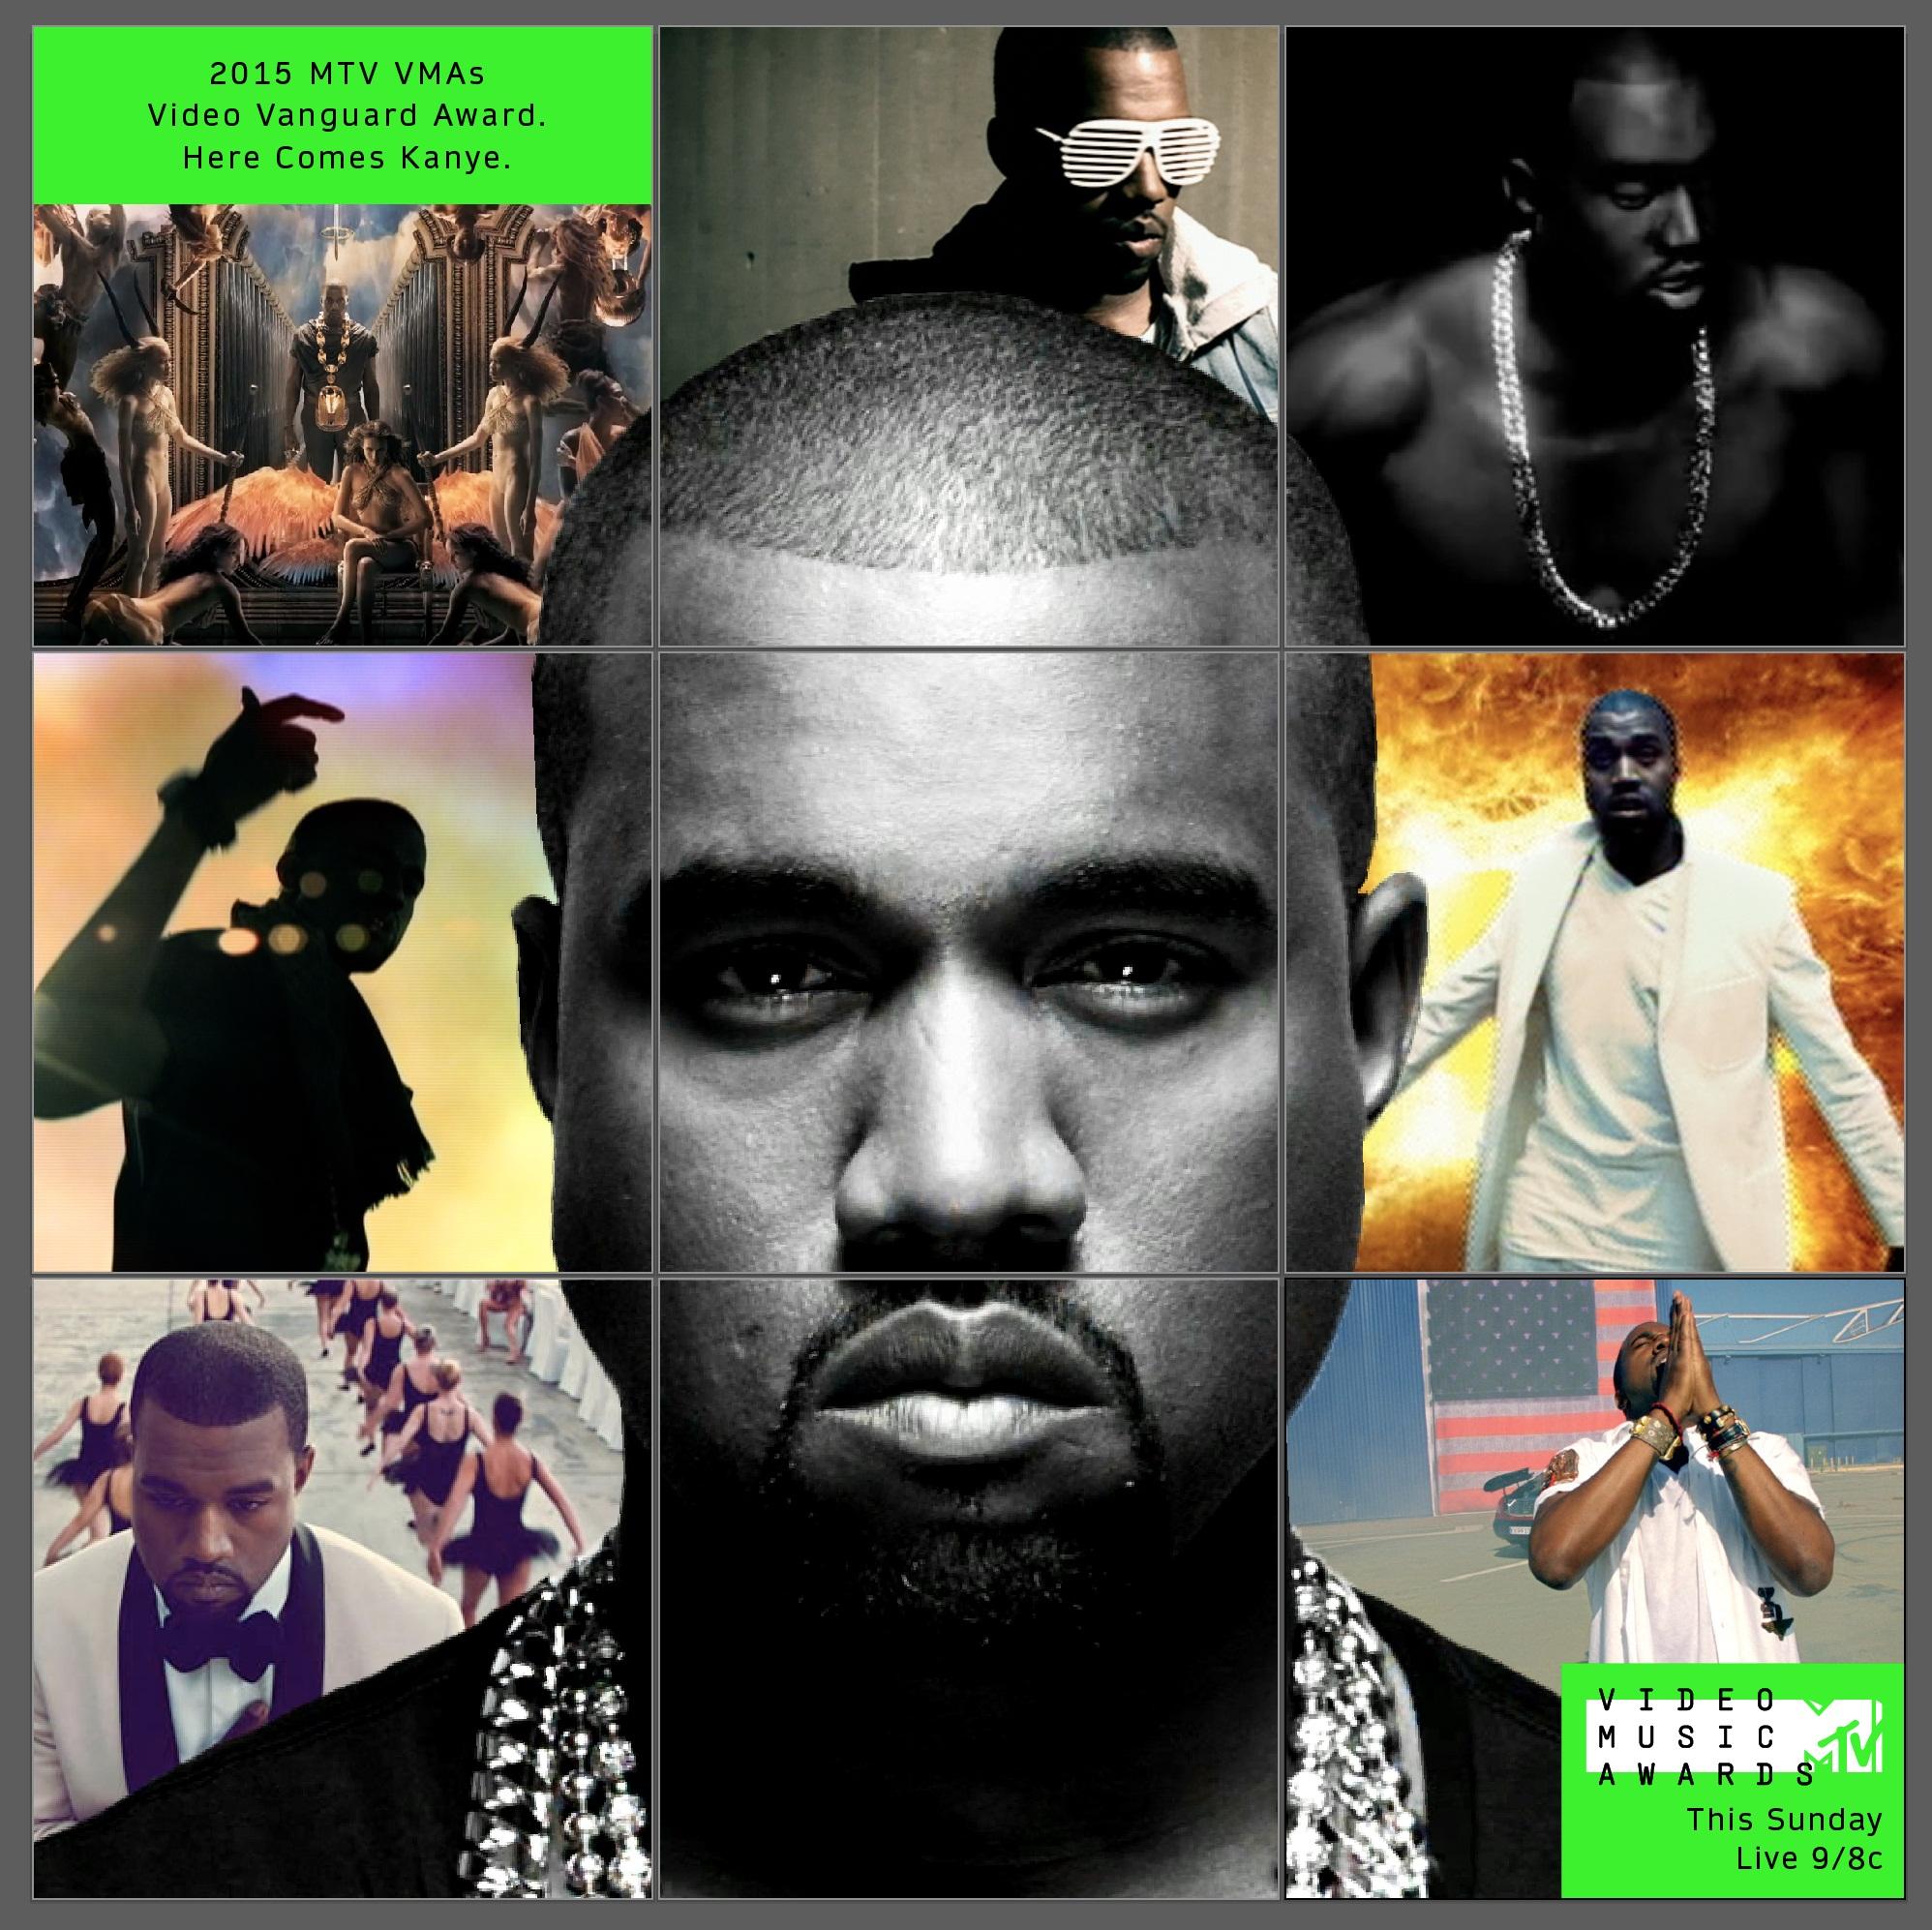 2015 MTV Video Music Awards gives Kanye West Video Vanguard Award ...